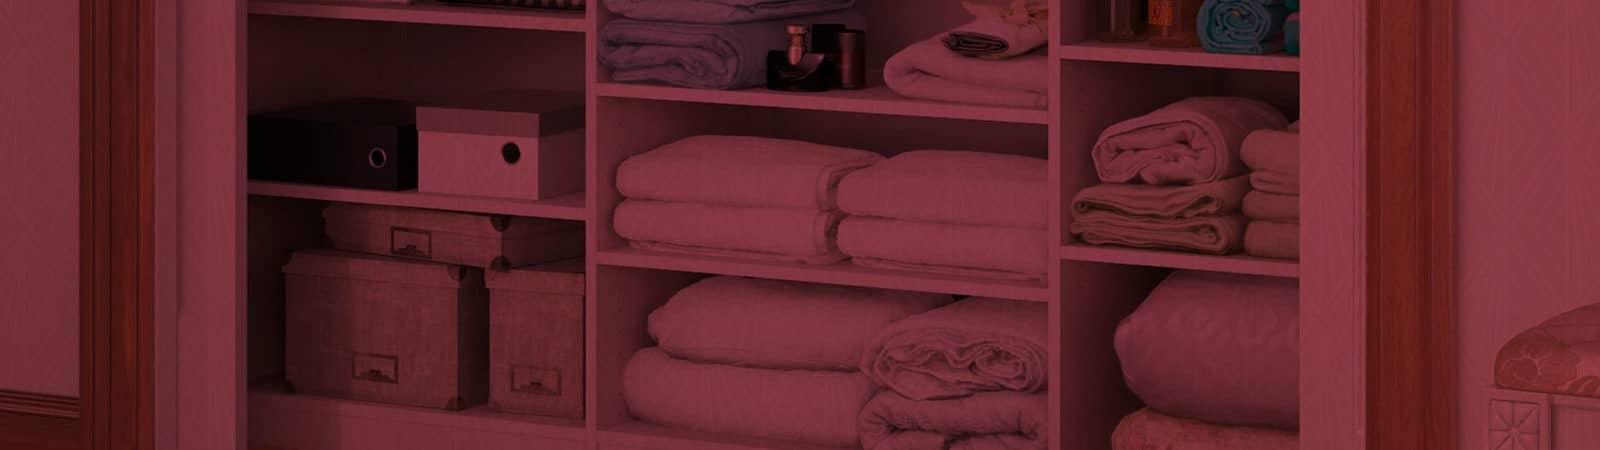 Como organizar as roupas de cama, mesa e banho